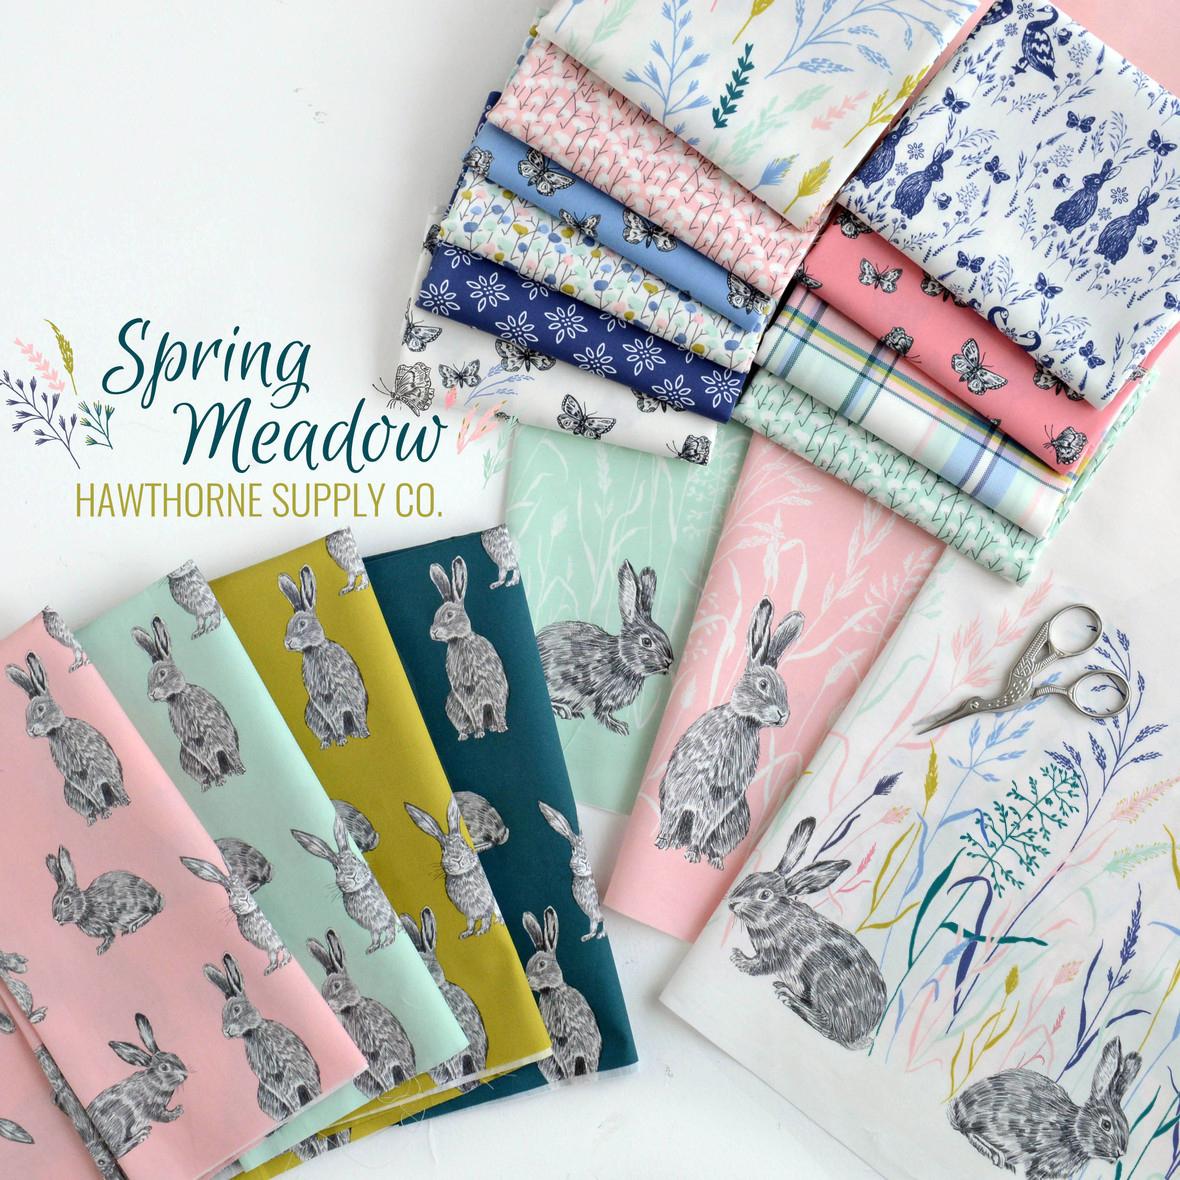 Spring Meadow Fabric Poster Hawthorne Supply Co edit JPG